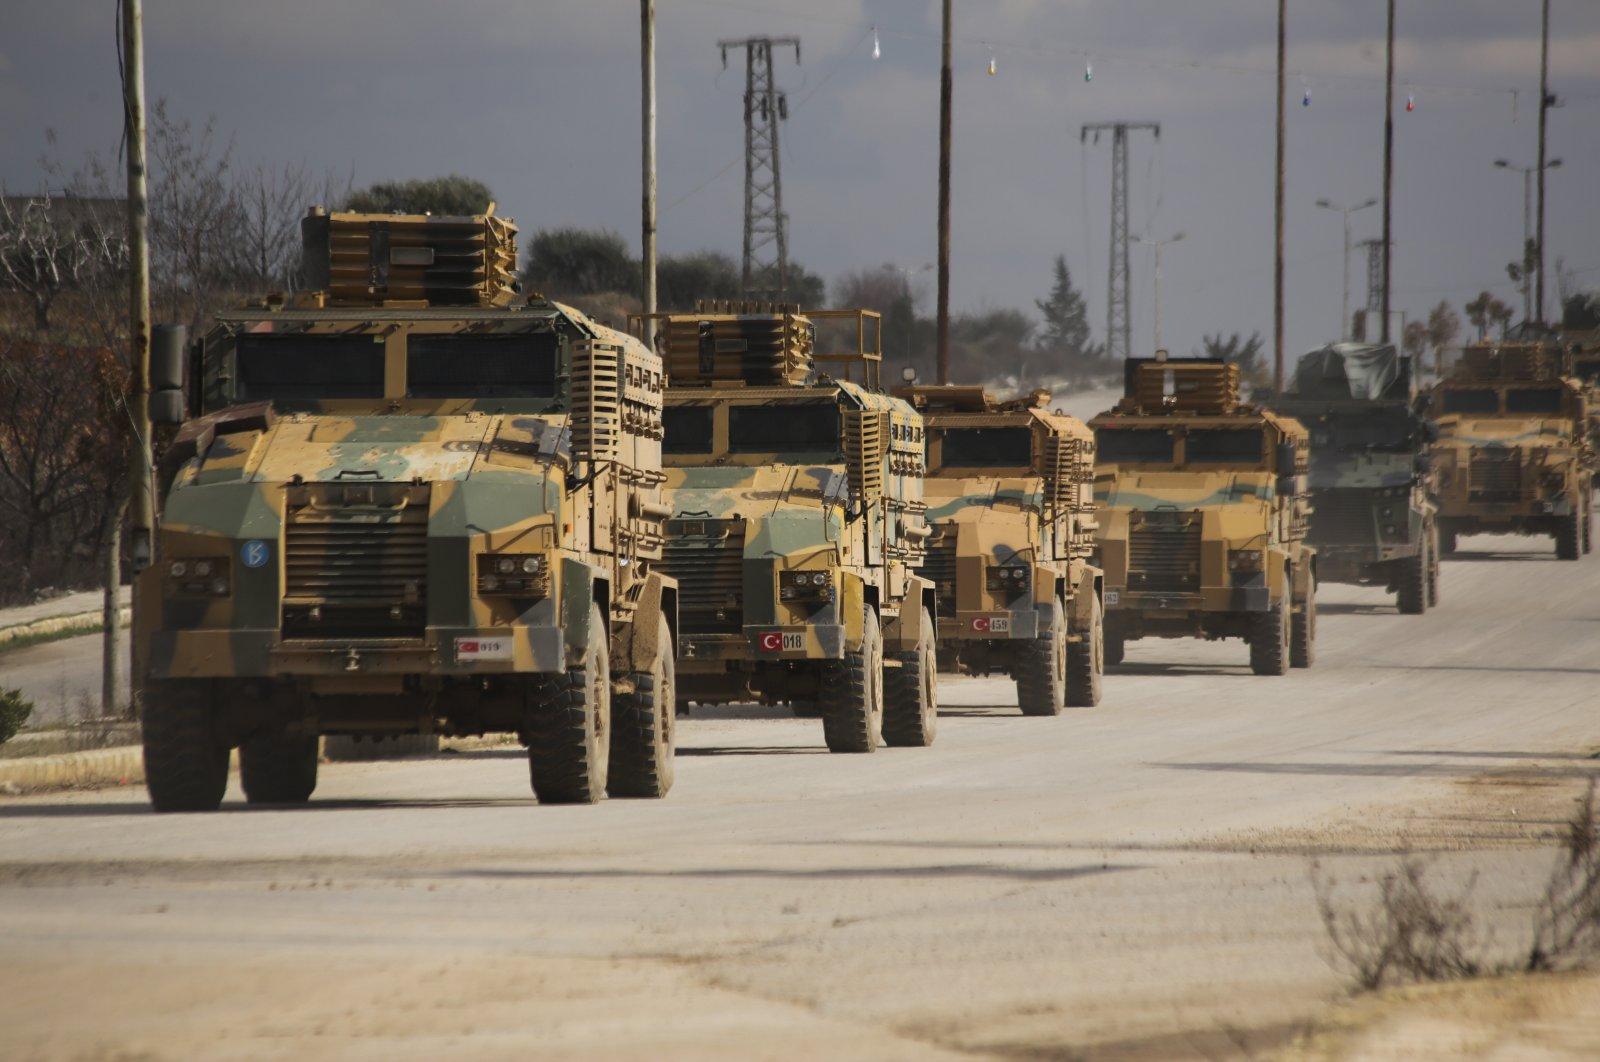 Turkish military convoy drives in Idlib province, Syria, Feb. 22, 2020. (AP Photo)